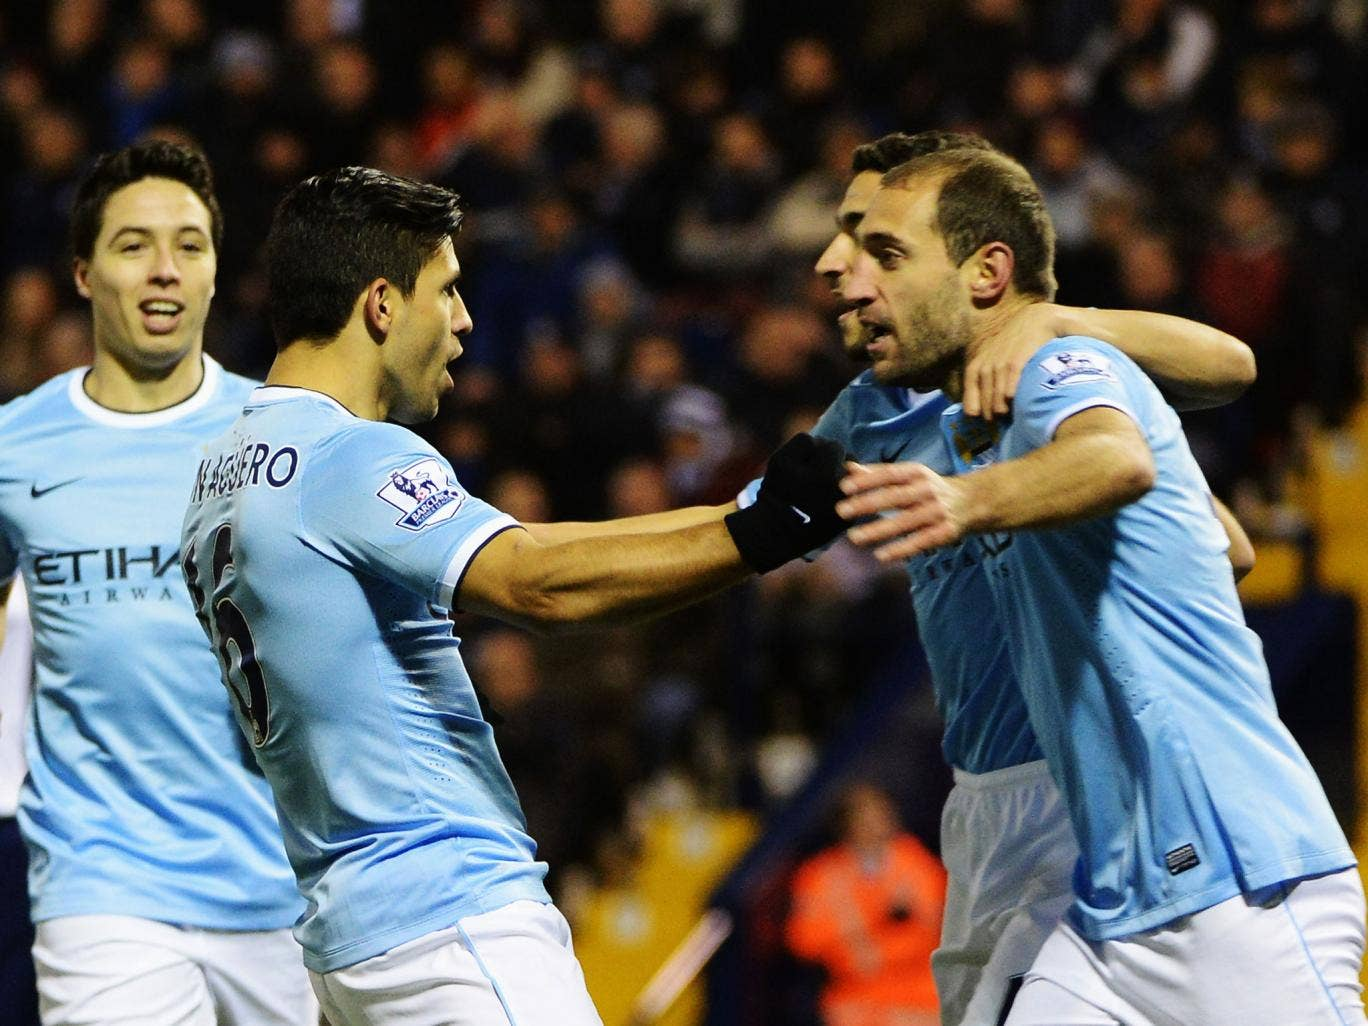 Sergio Aguero and Pablo Zabaleta celebrate after the striker scores for Manchester City